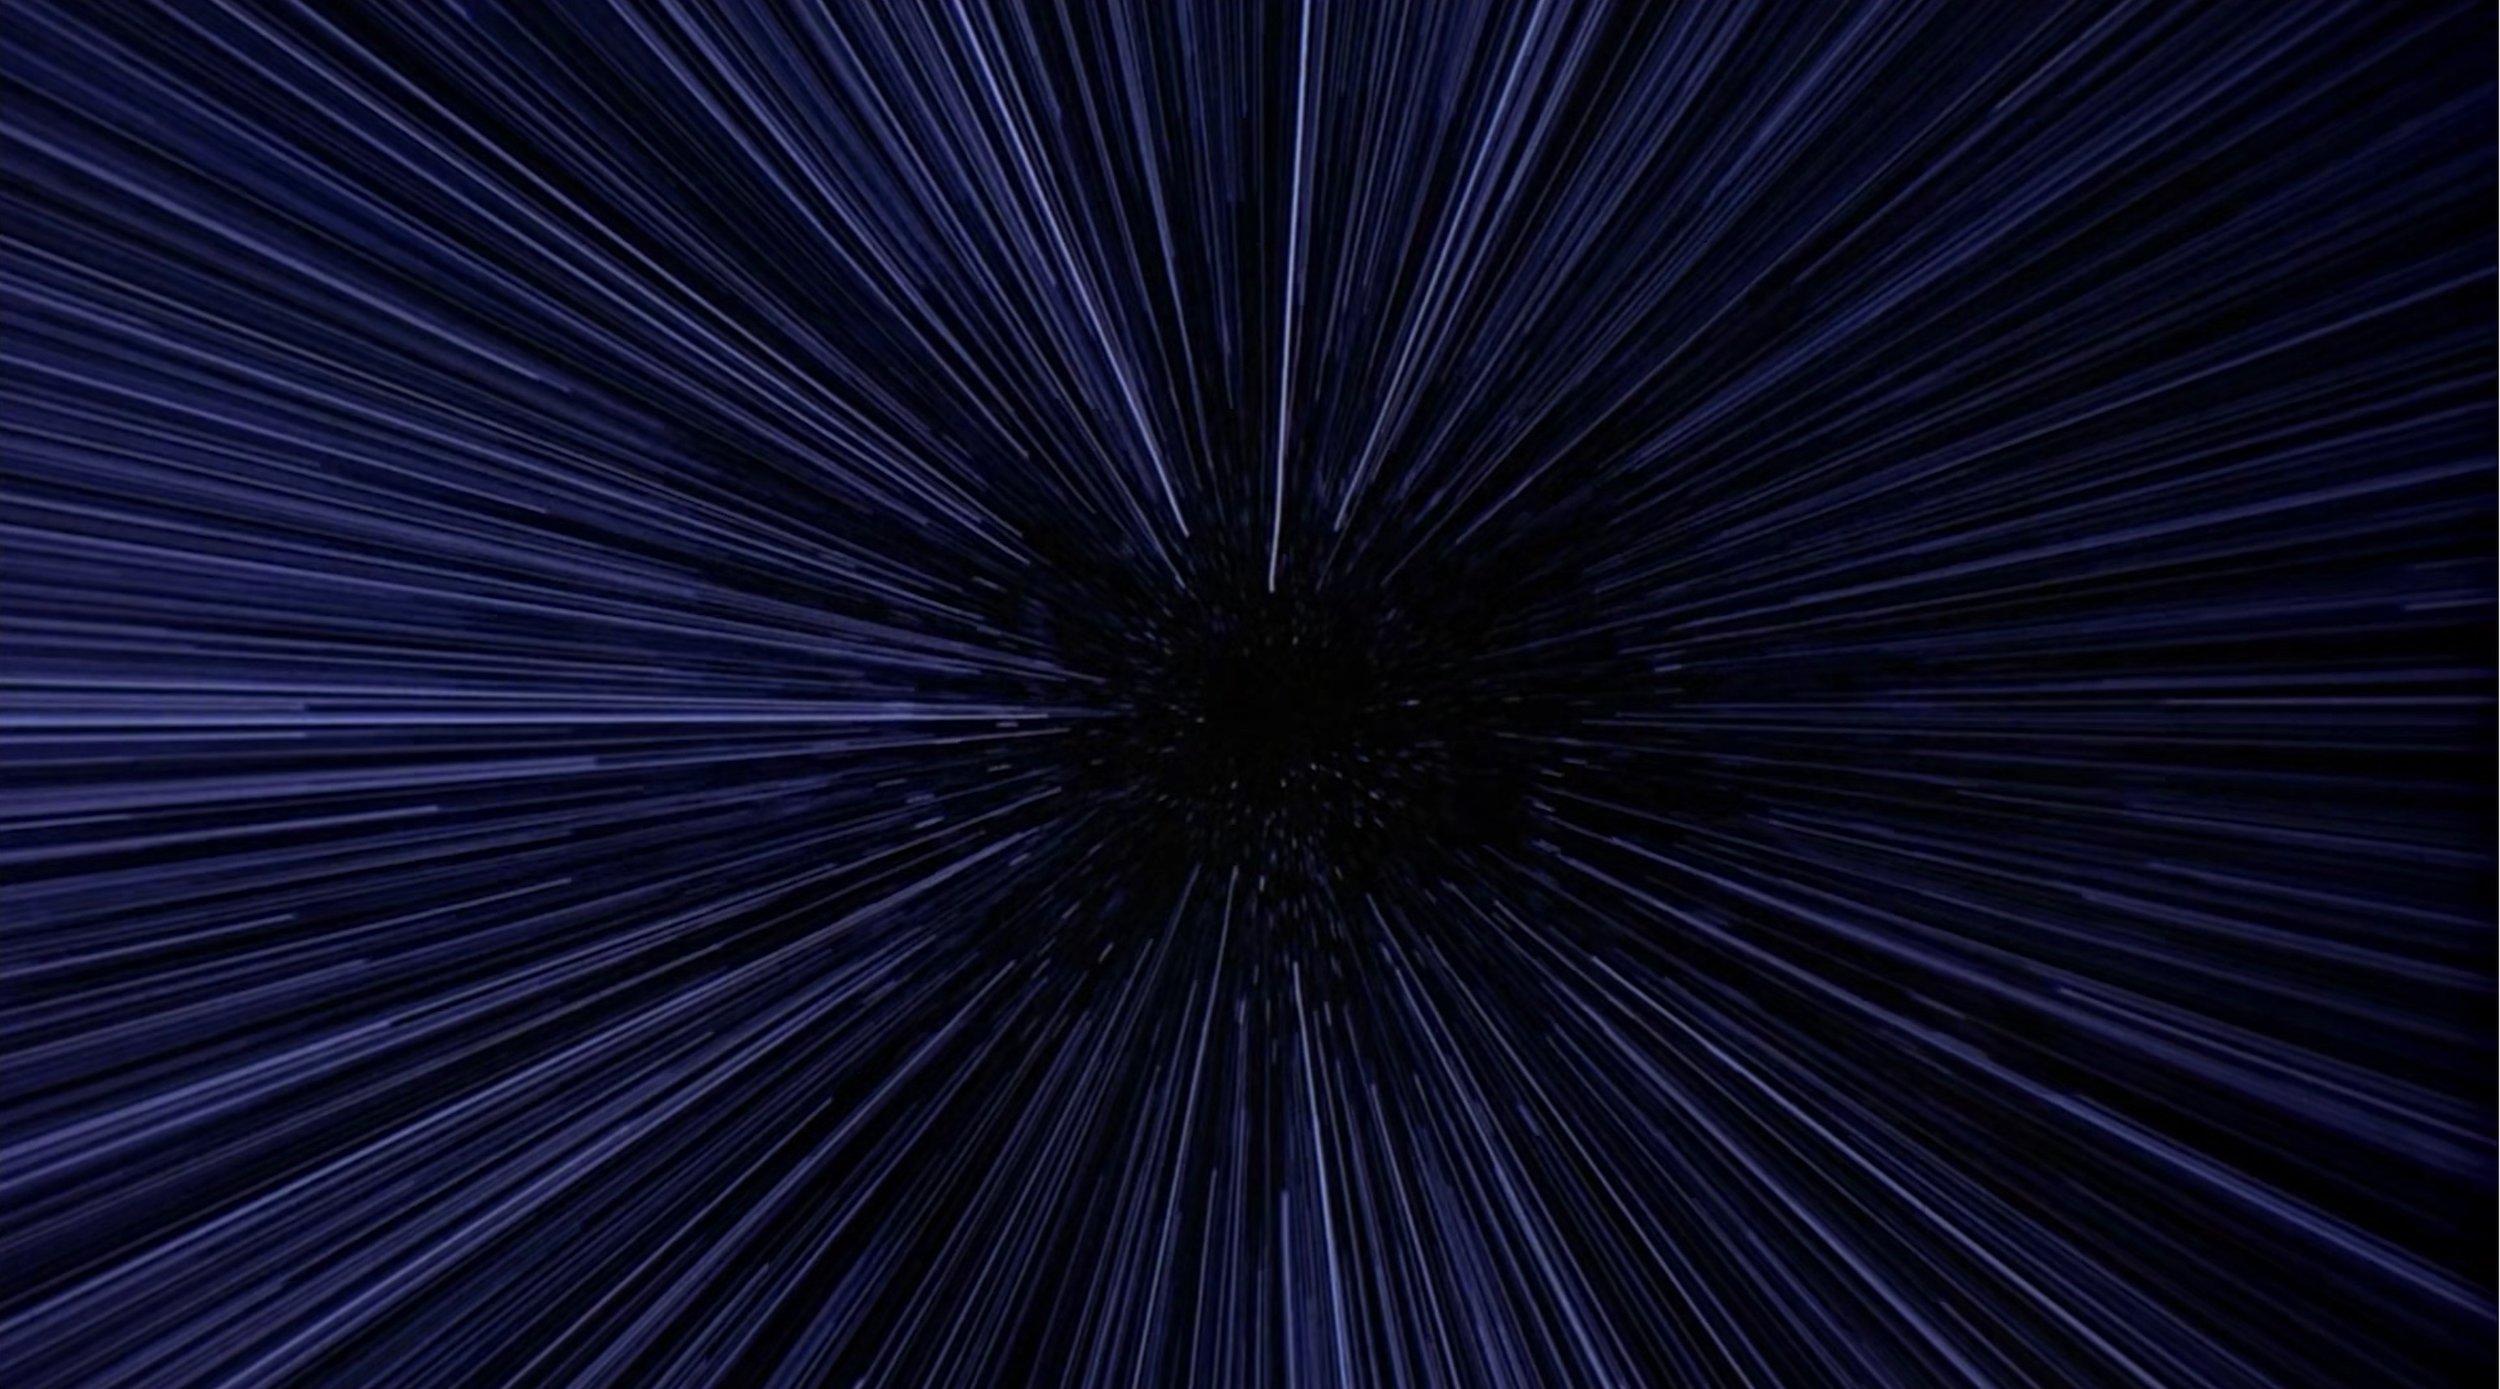 lurf_star_1980_bbts.jpg